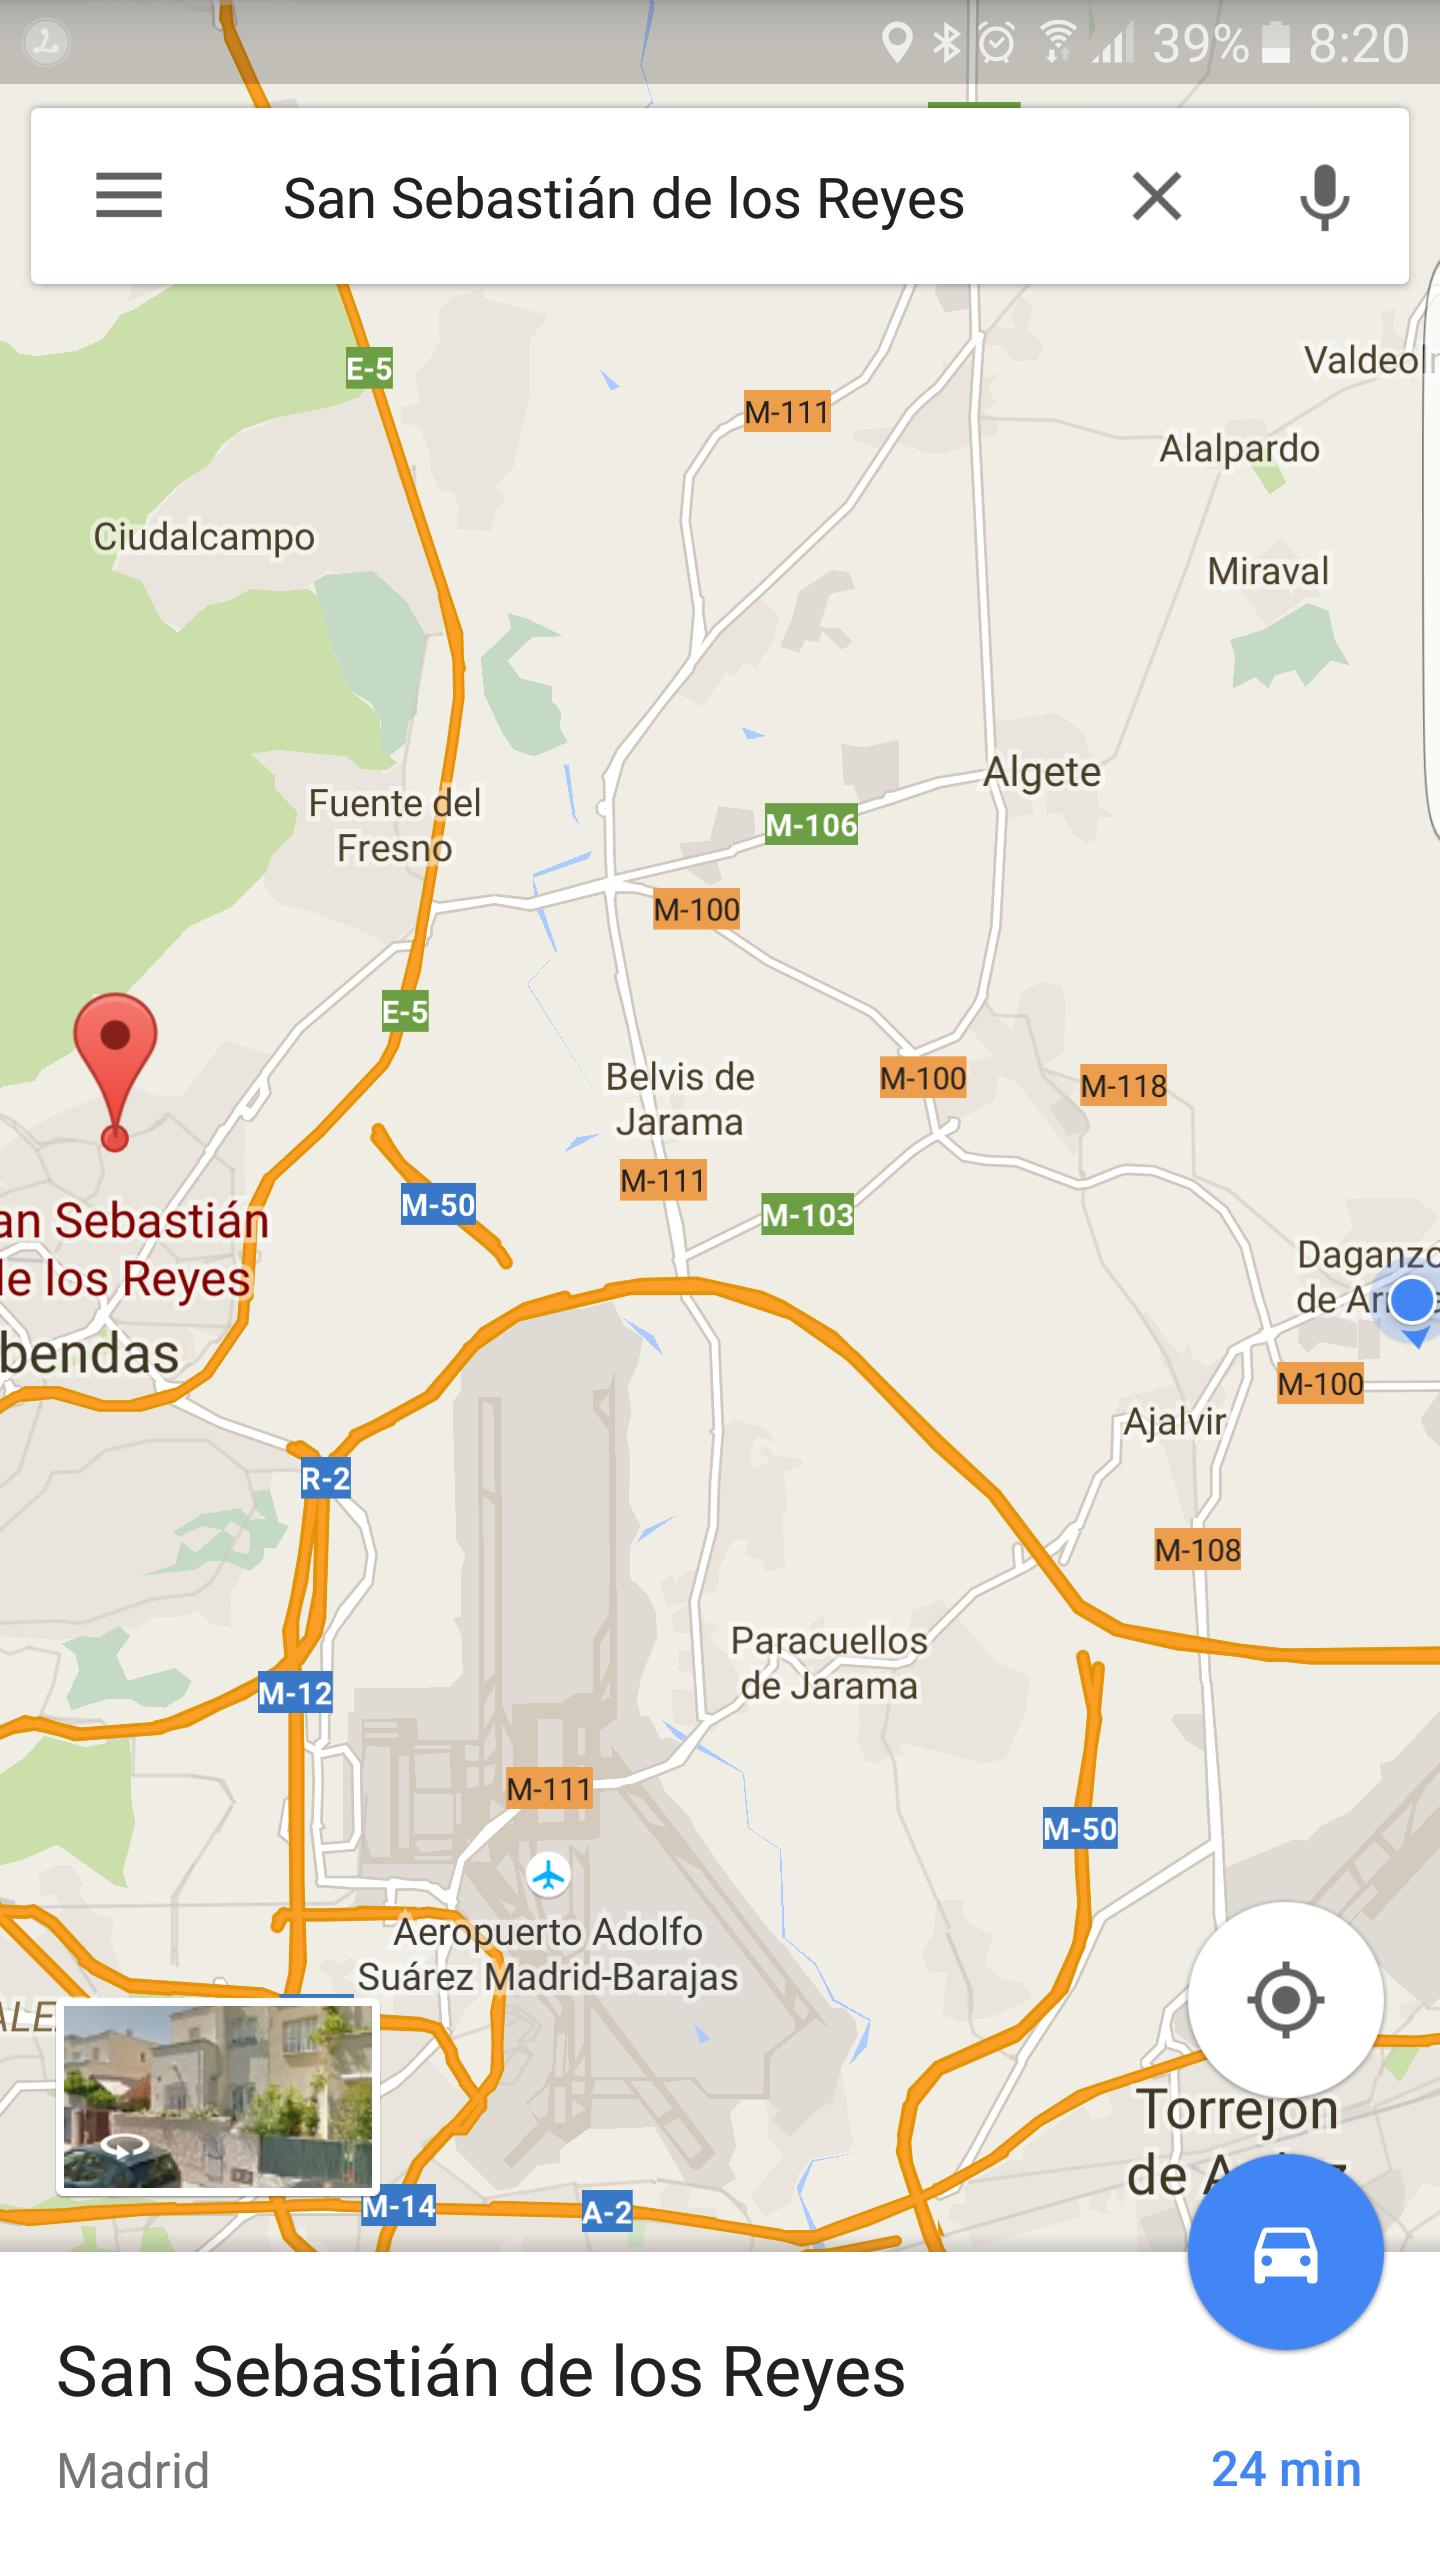 Ruta creada con la aplicación Google Maps 9.22